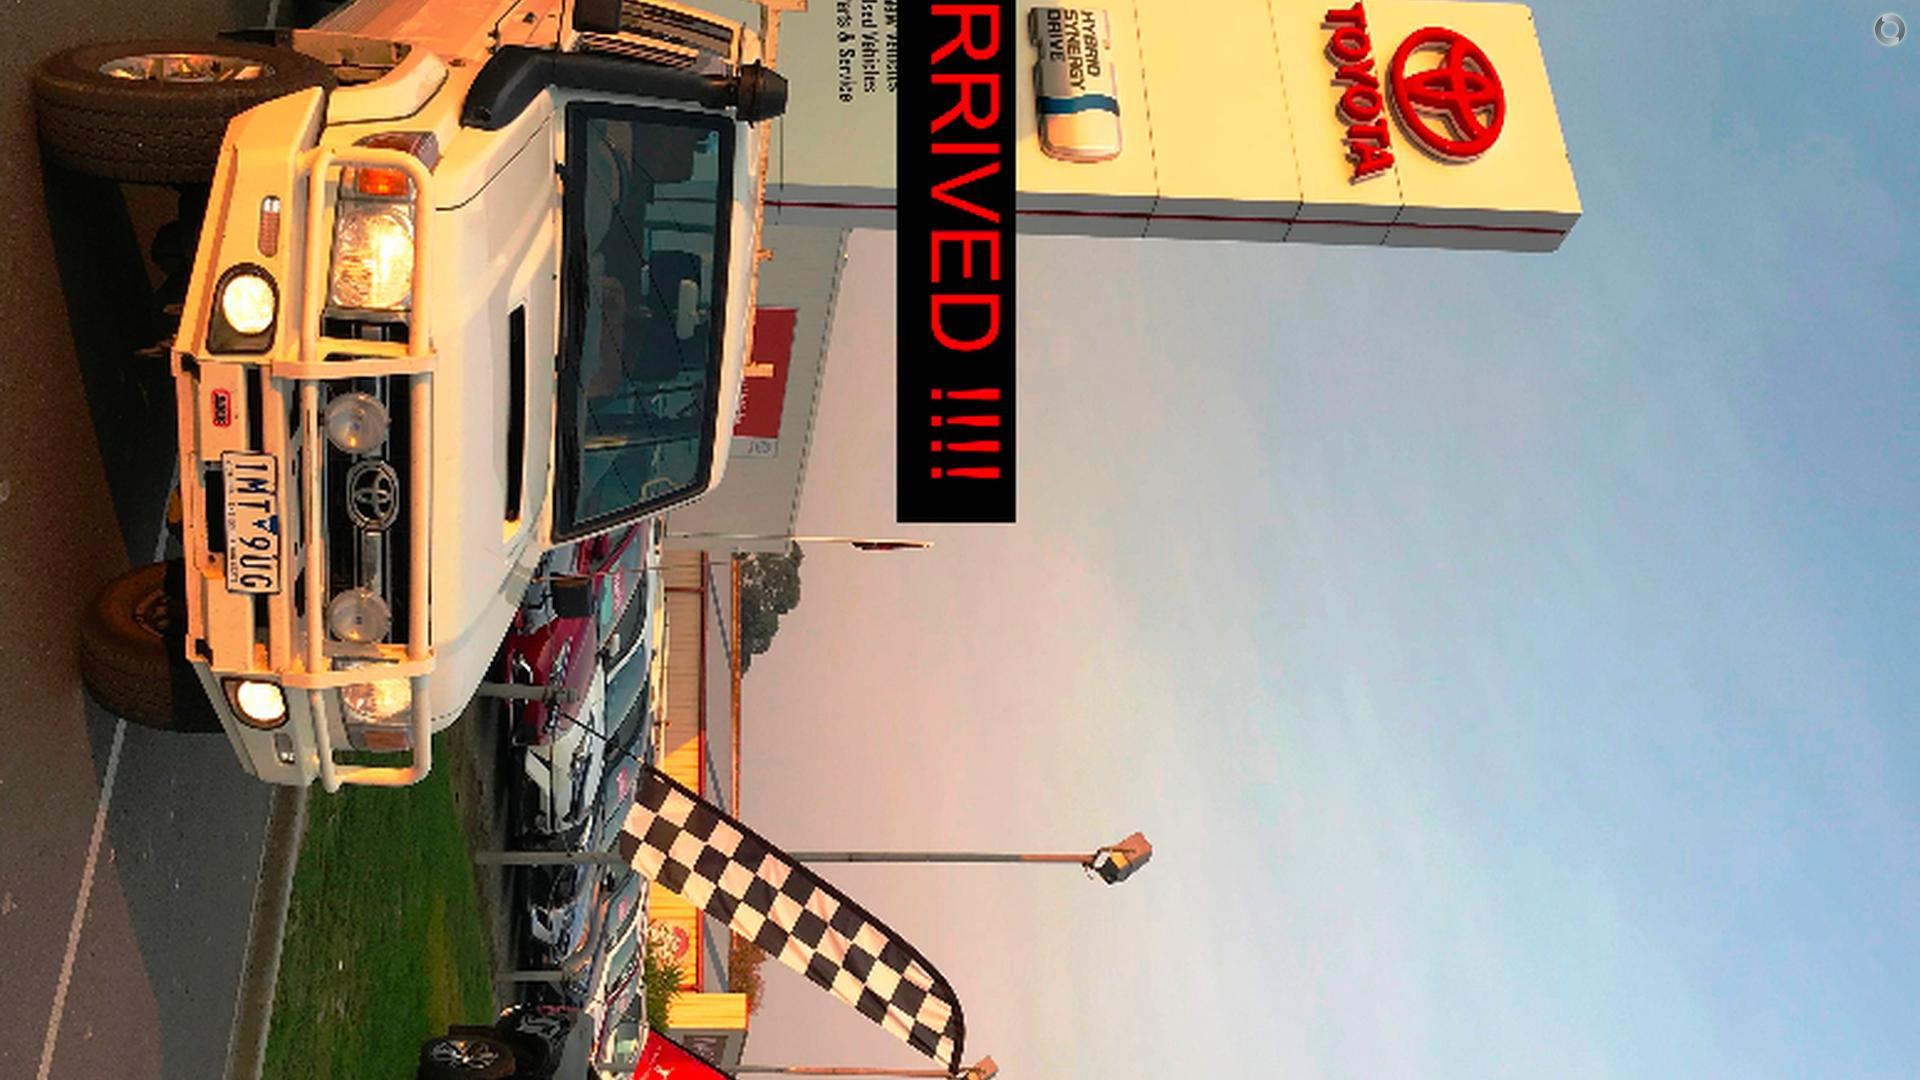 2014 Toyota Landcruiser Gxl Vdj79r Warragul Toyota